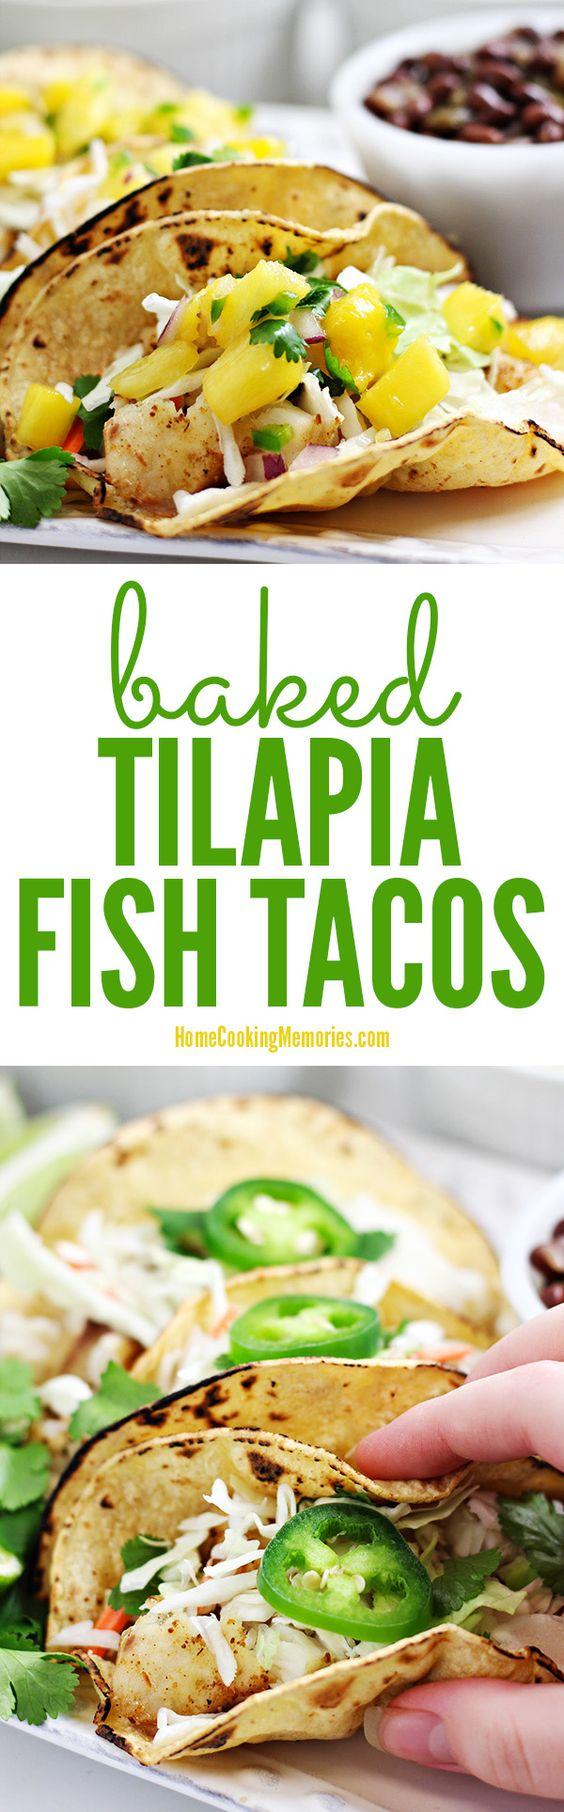 Baked tilapia fish tacos recipe for Fish tacos with tilapia